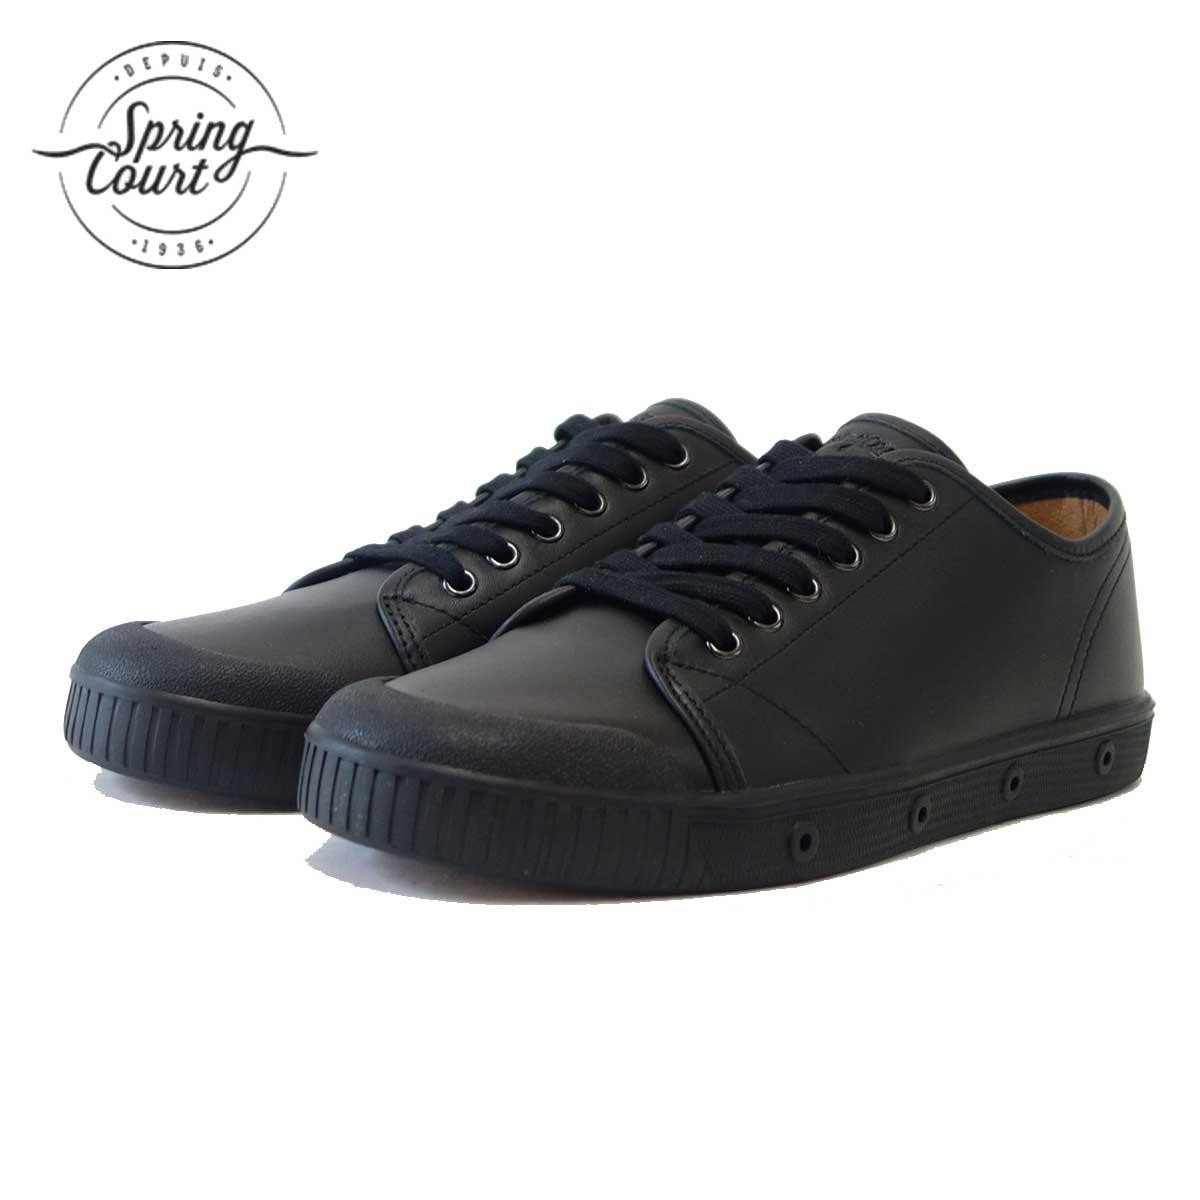 Spring Court スプリングコート G2S-V5(レディース)G2 Leather BLACK 天然皮革のローカットスニーカー 「靴」